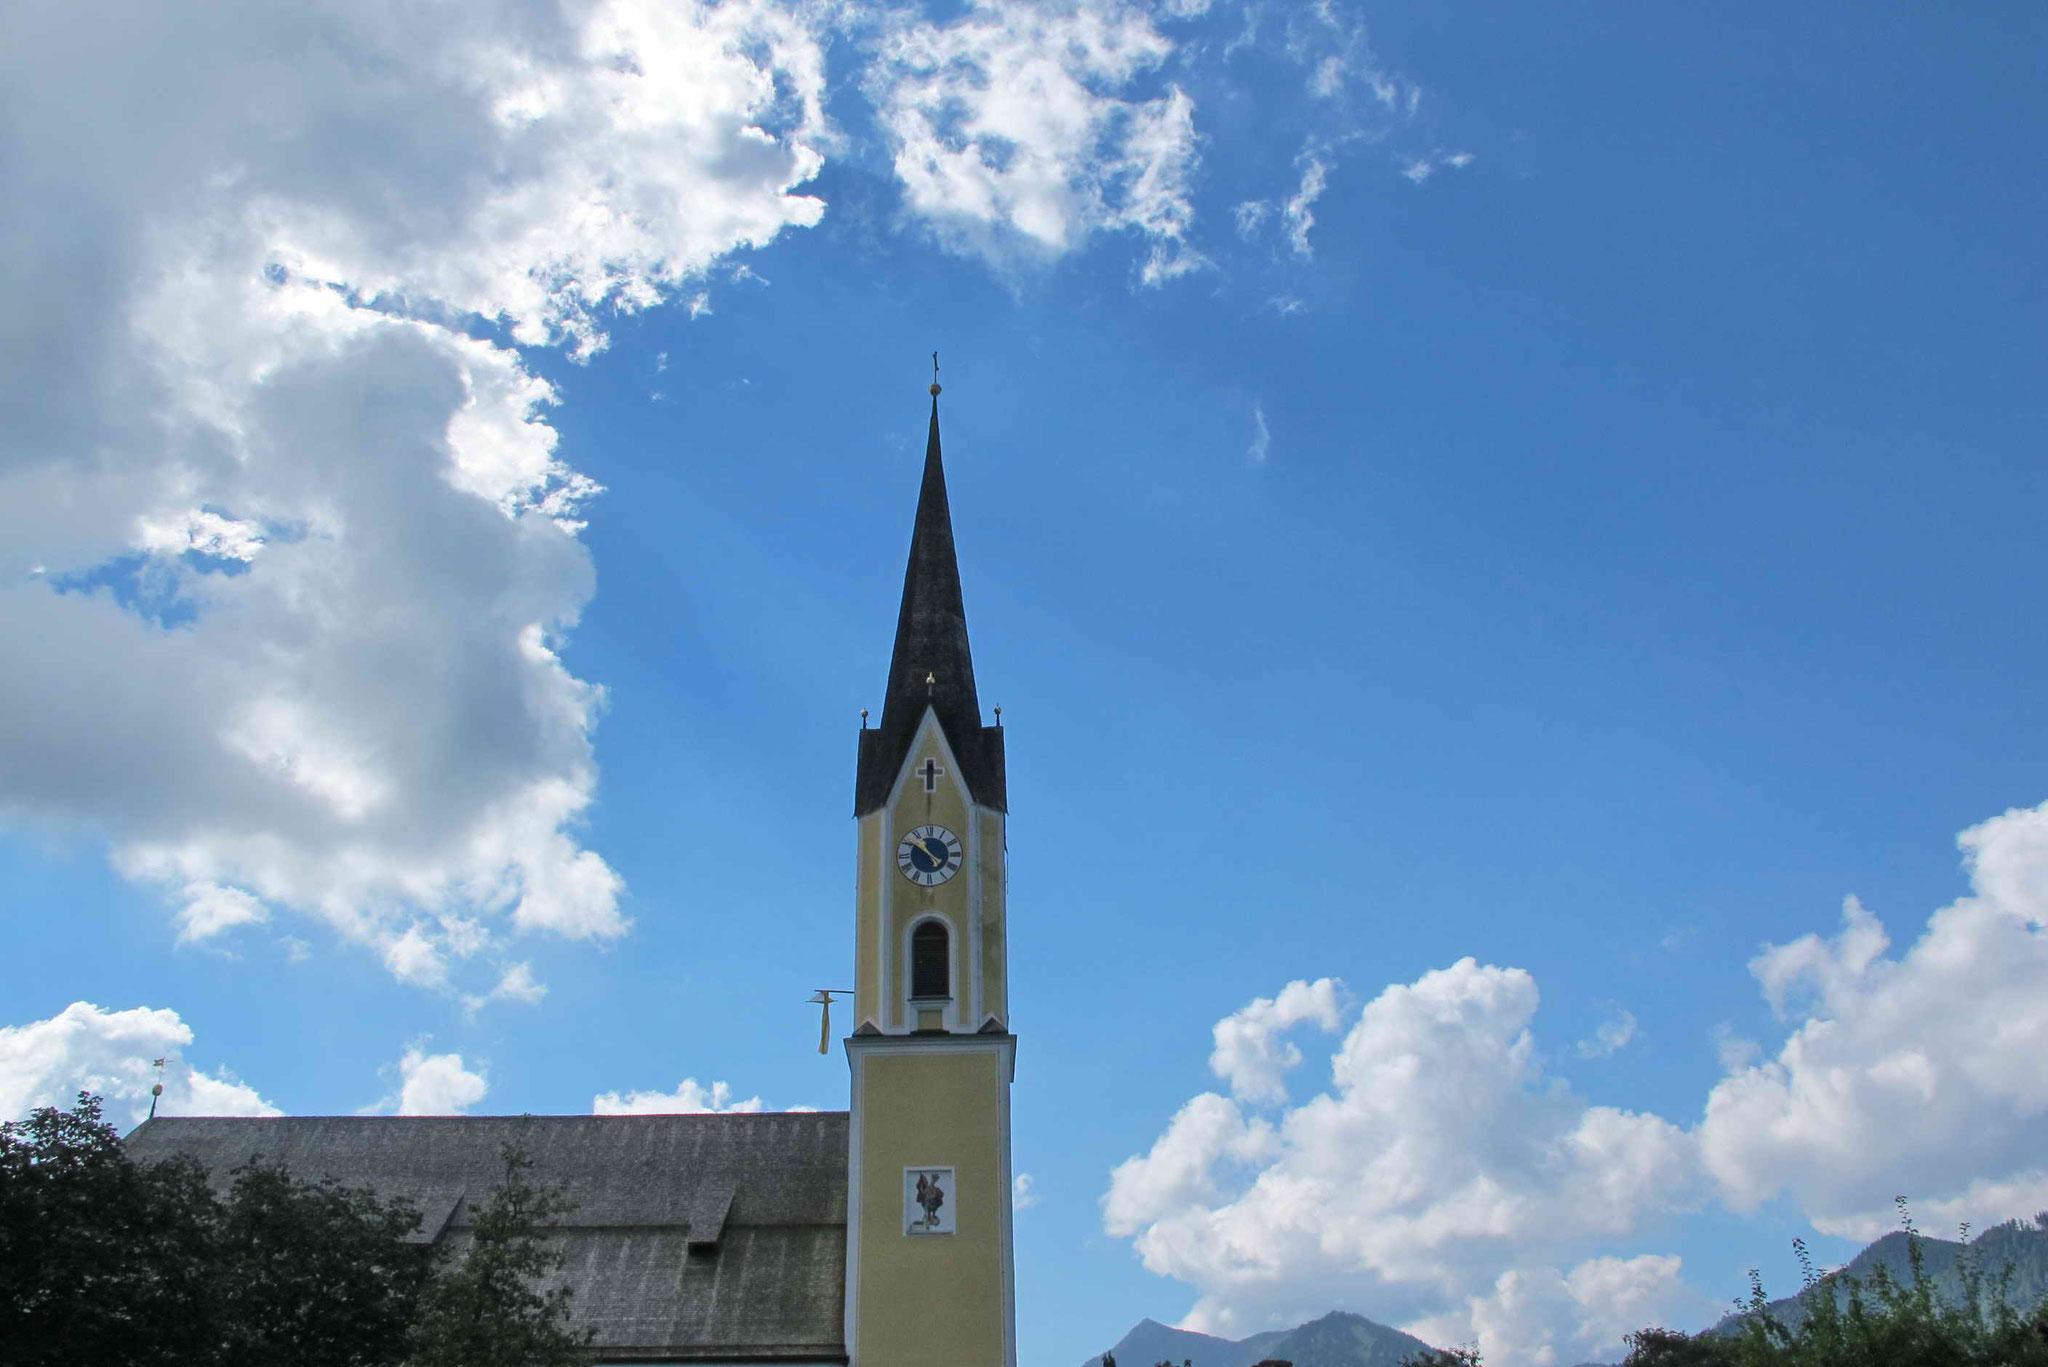 Patroziniums-Gottesdienst in St. Sixtus